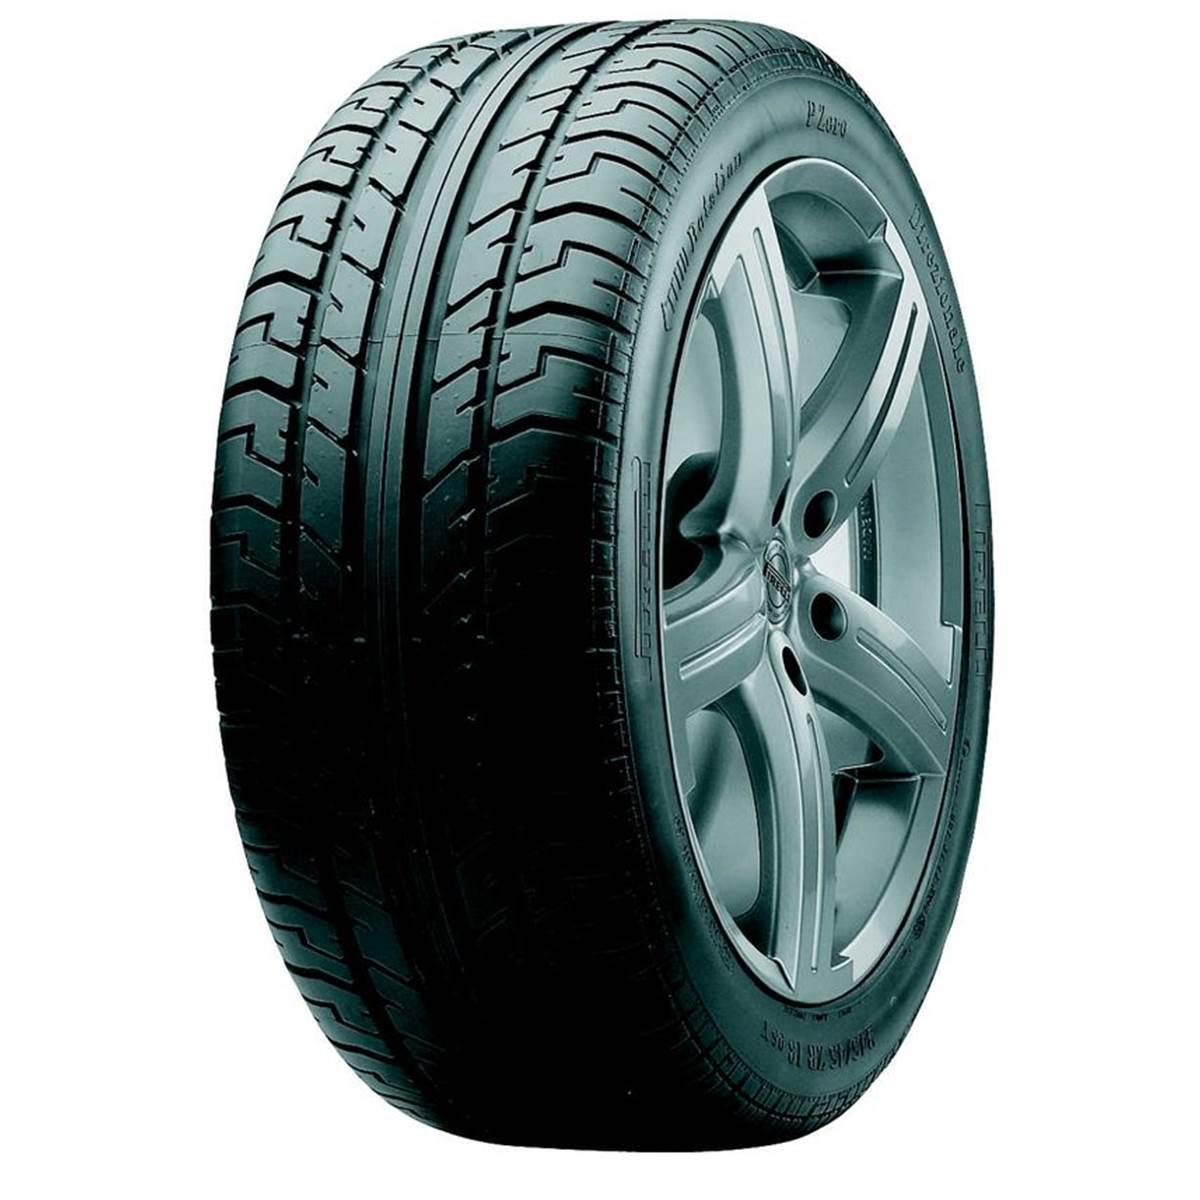 Pneu Pirelli 225/40R18 88Y Pzero Direzionale